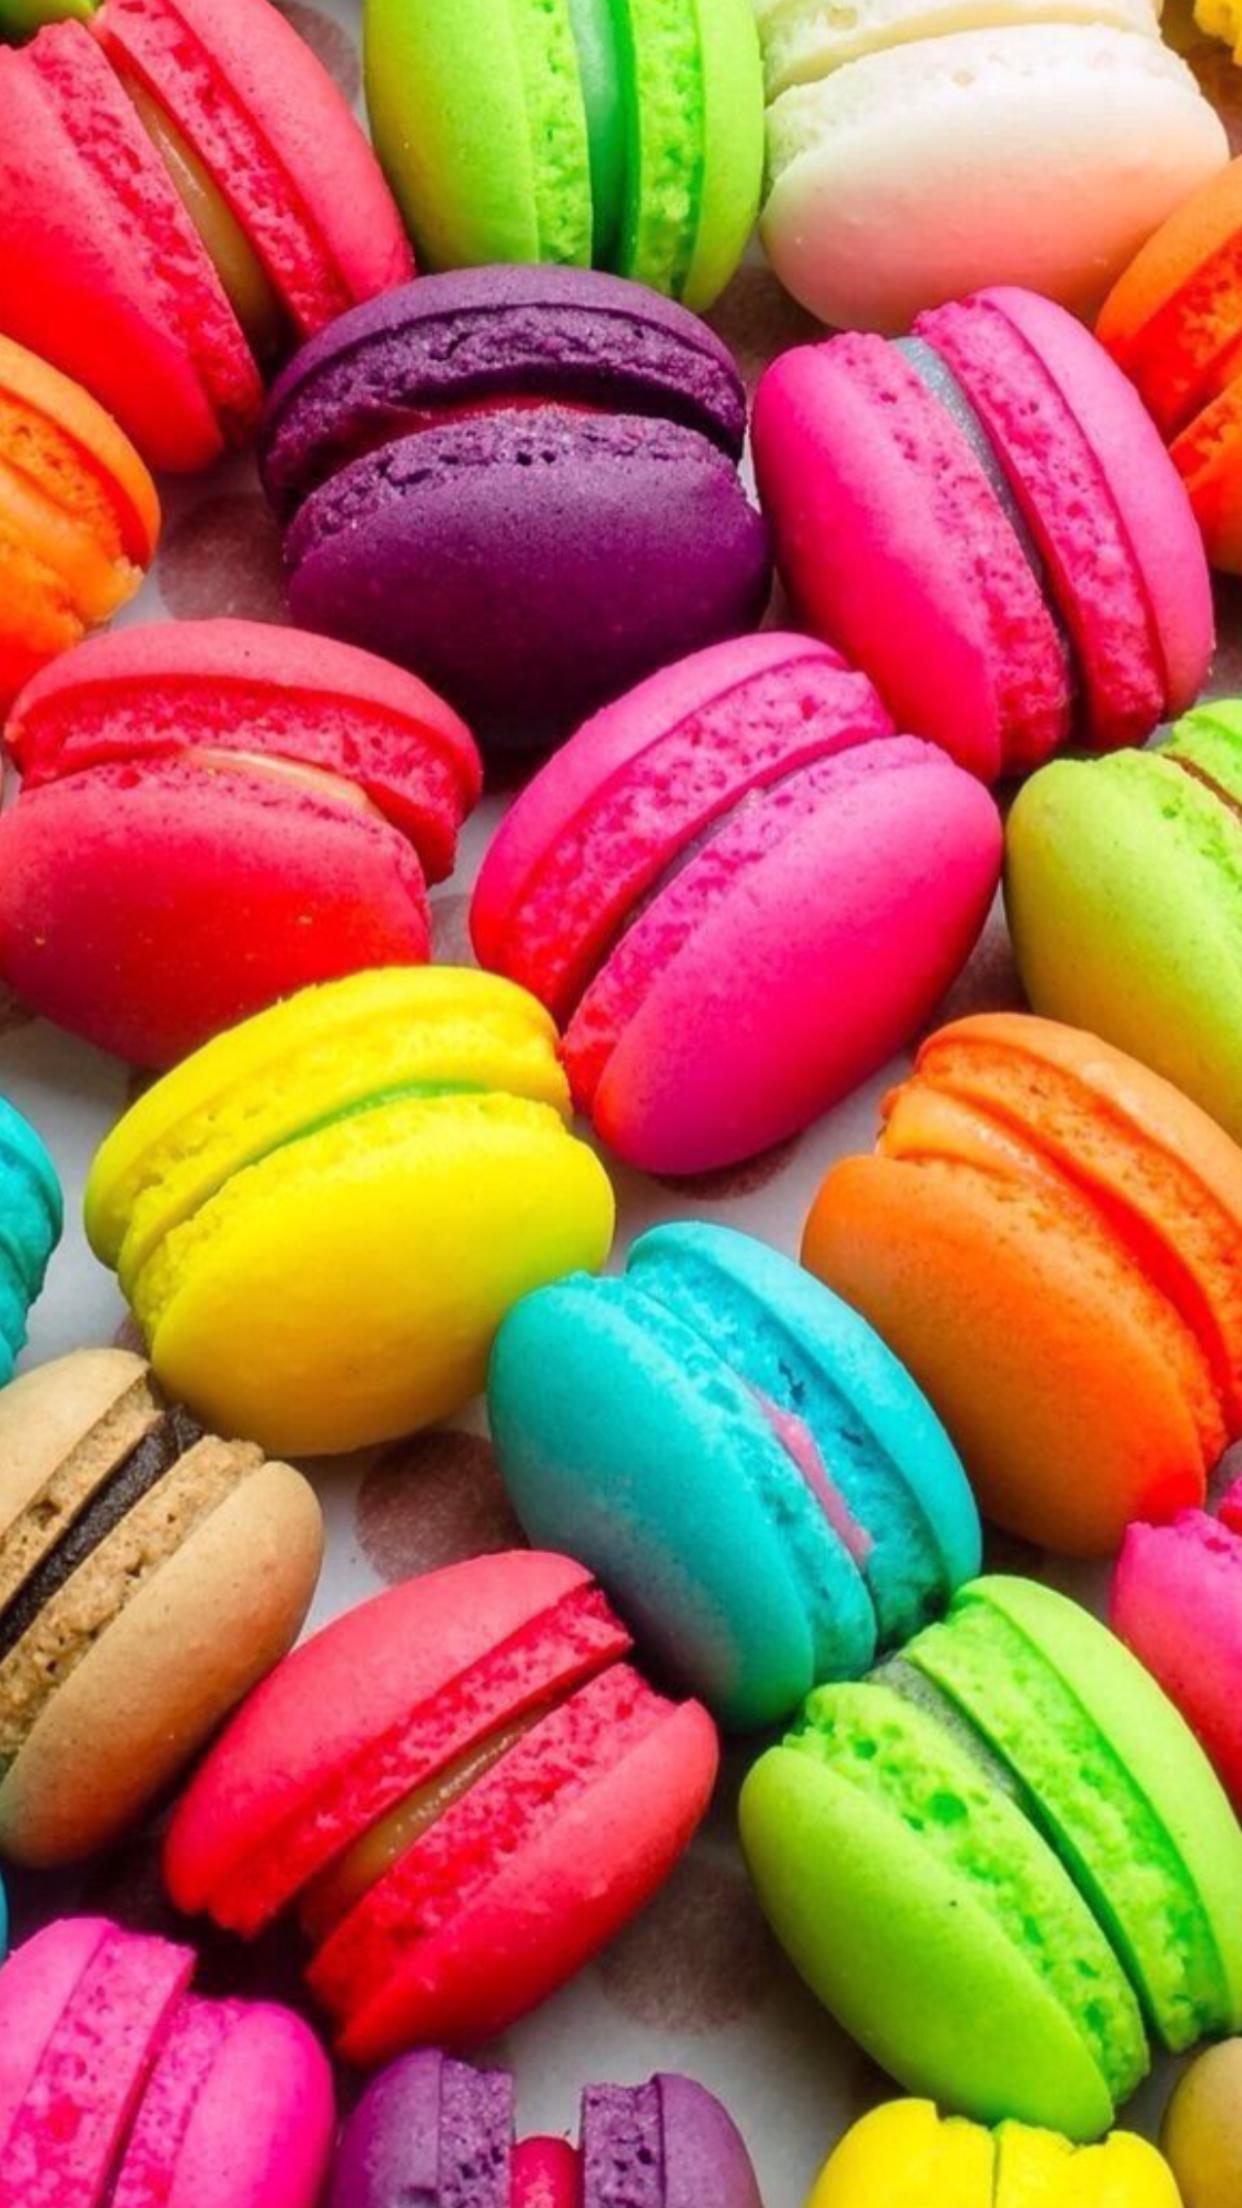 Pin De Meagan Fulmer Em Macarons Doces Coloridos Macaroons Imagem De Fundo Para Iphone